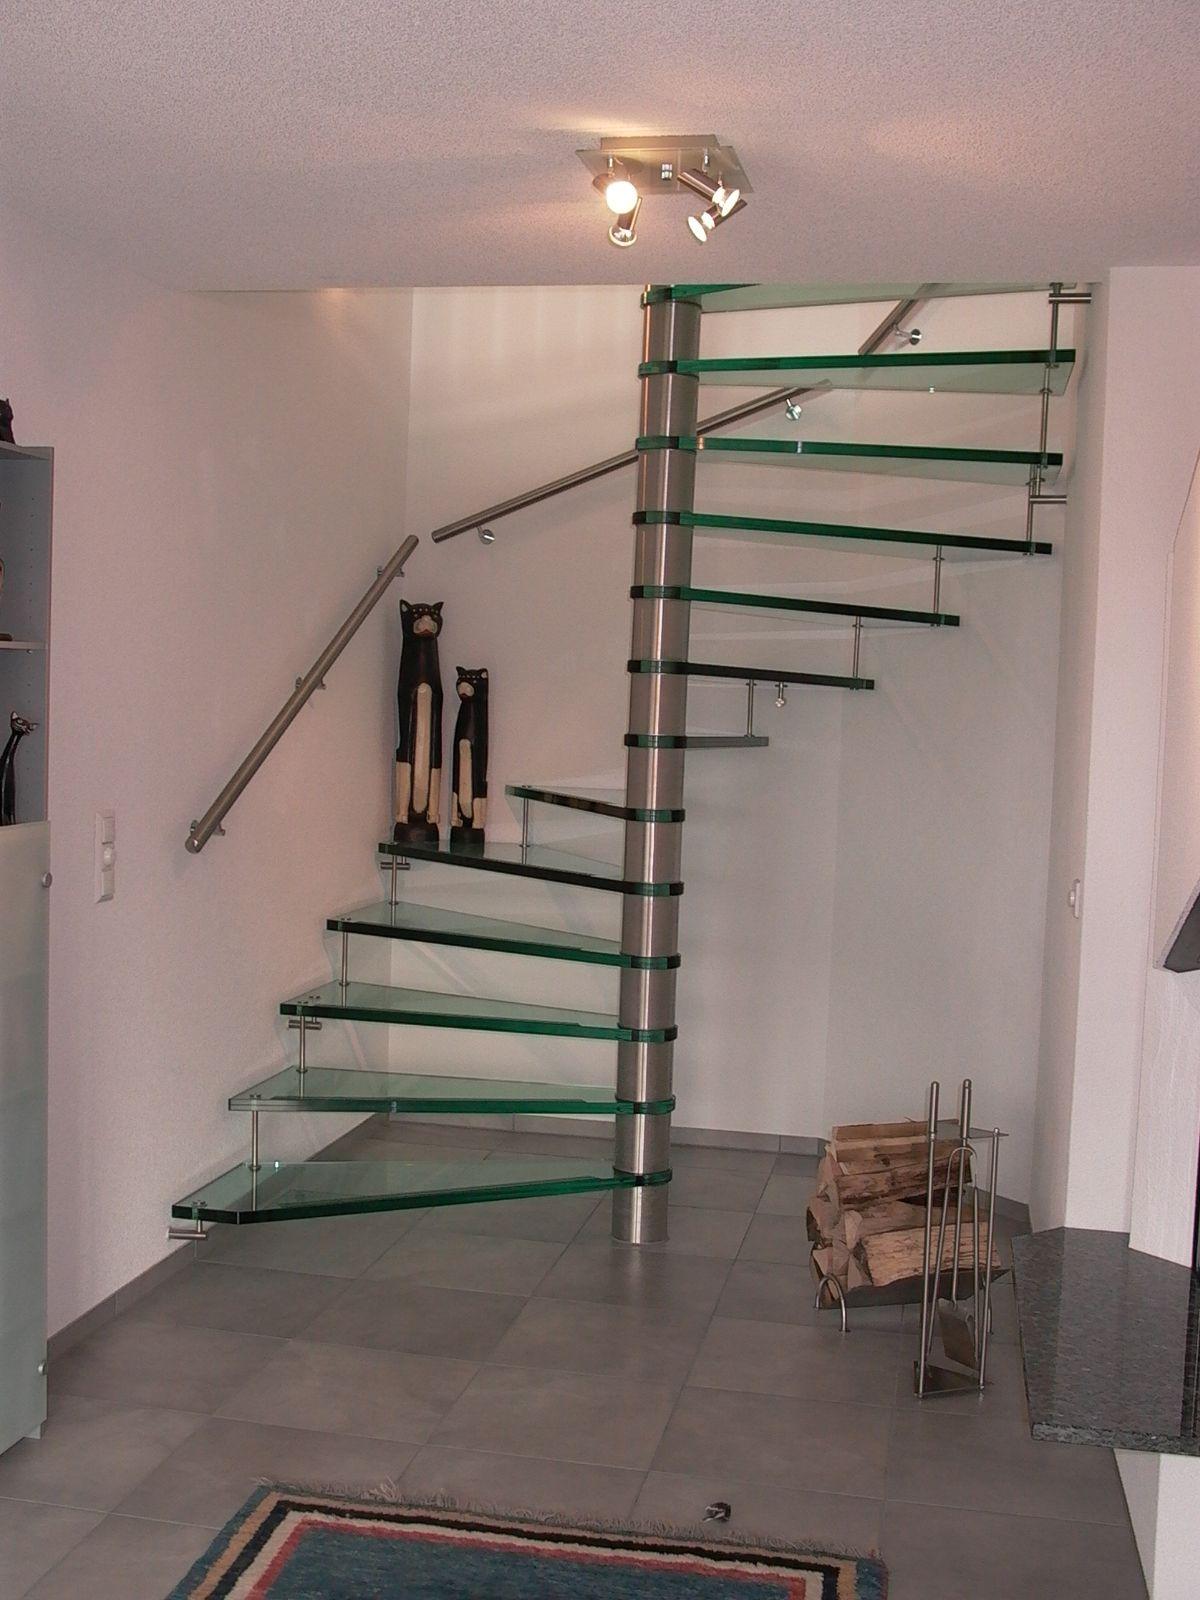 Stair Image 382